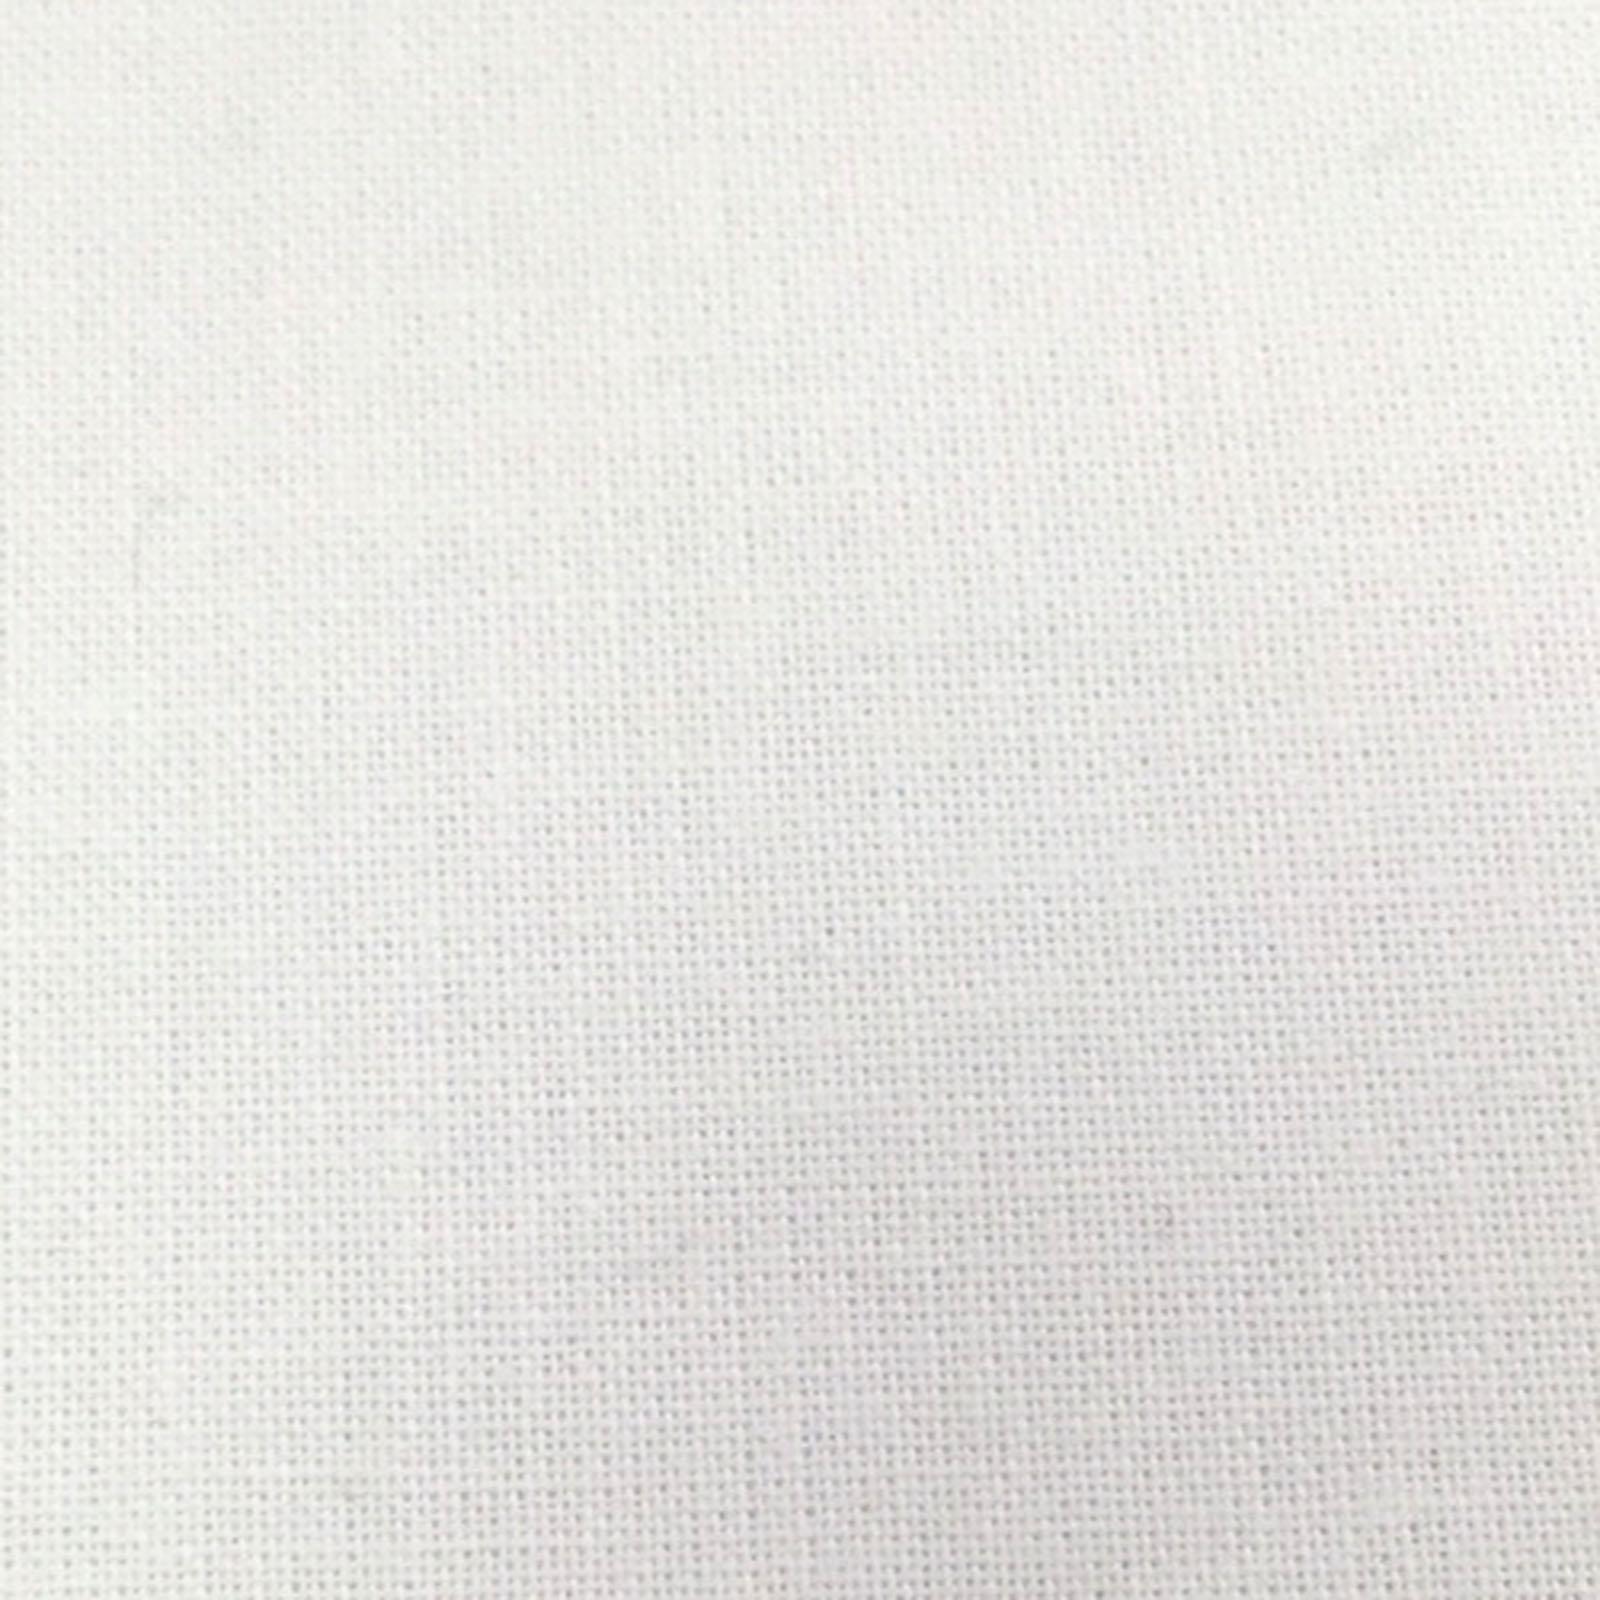 White Muslin - Flame Retardant